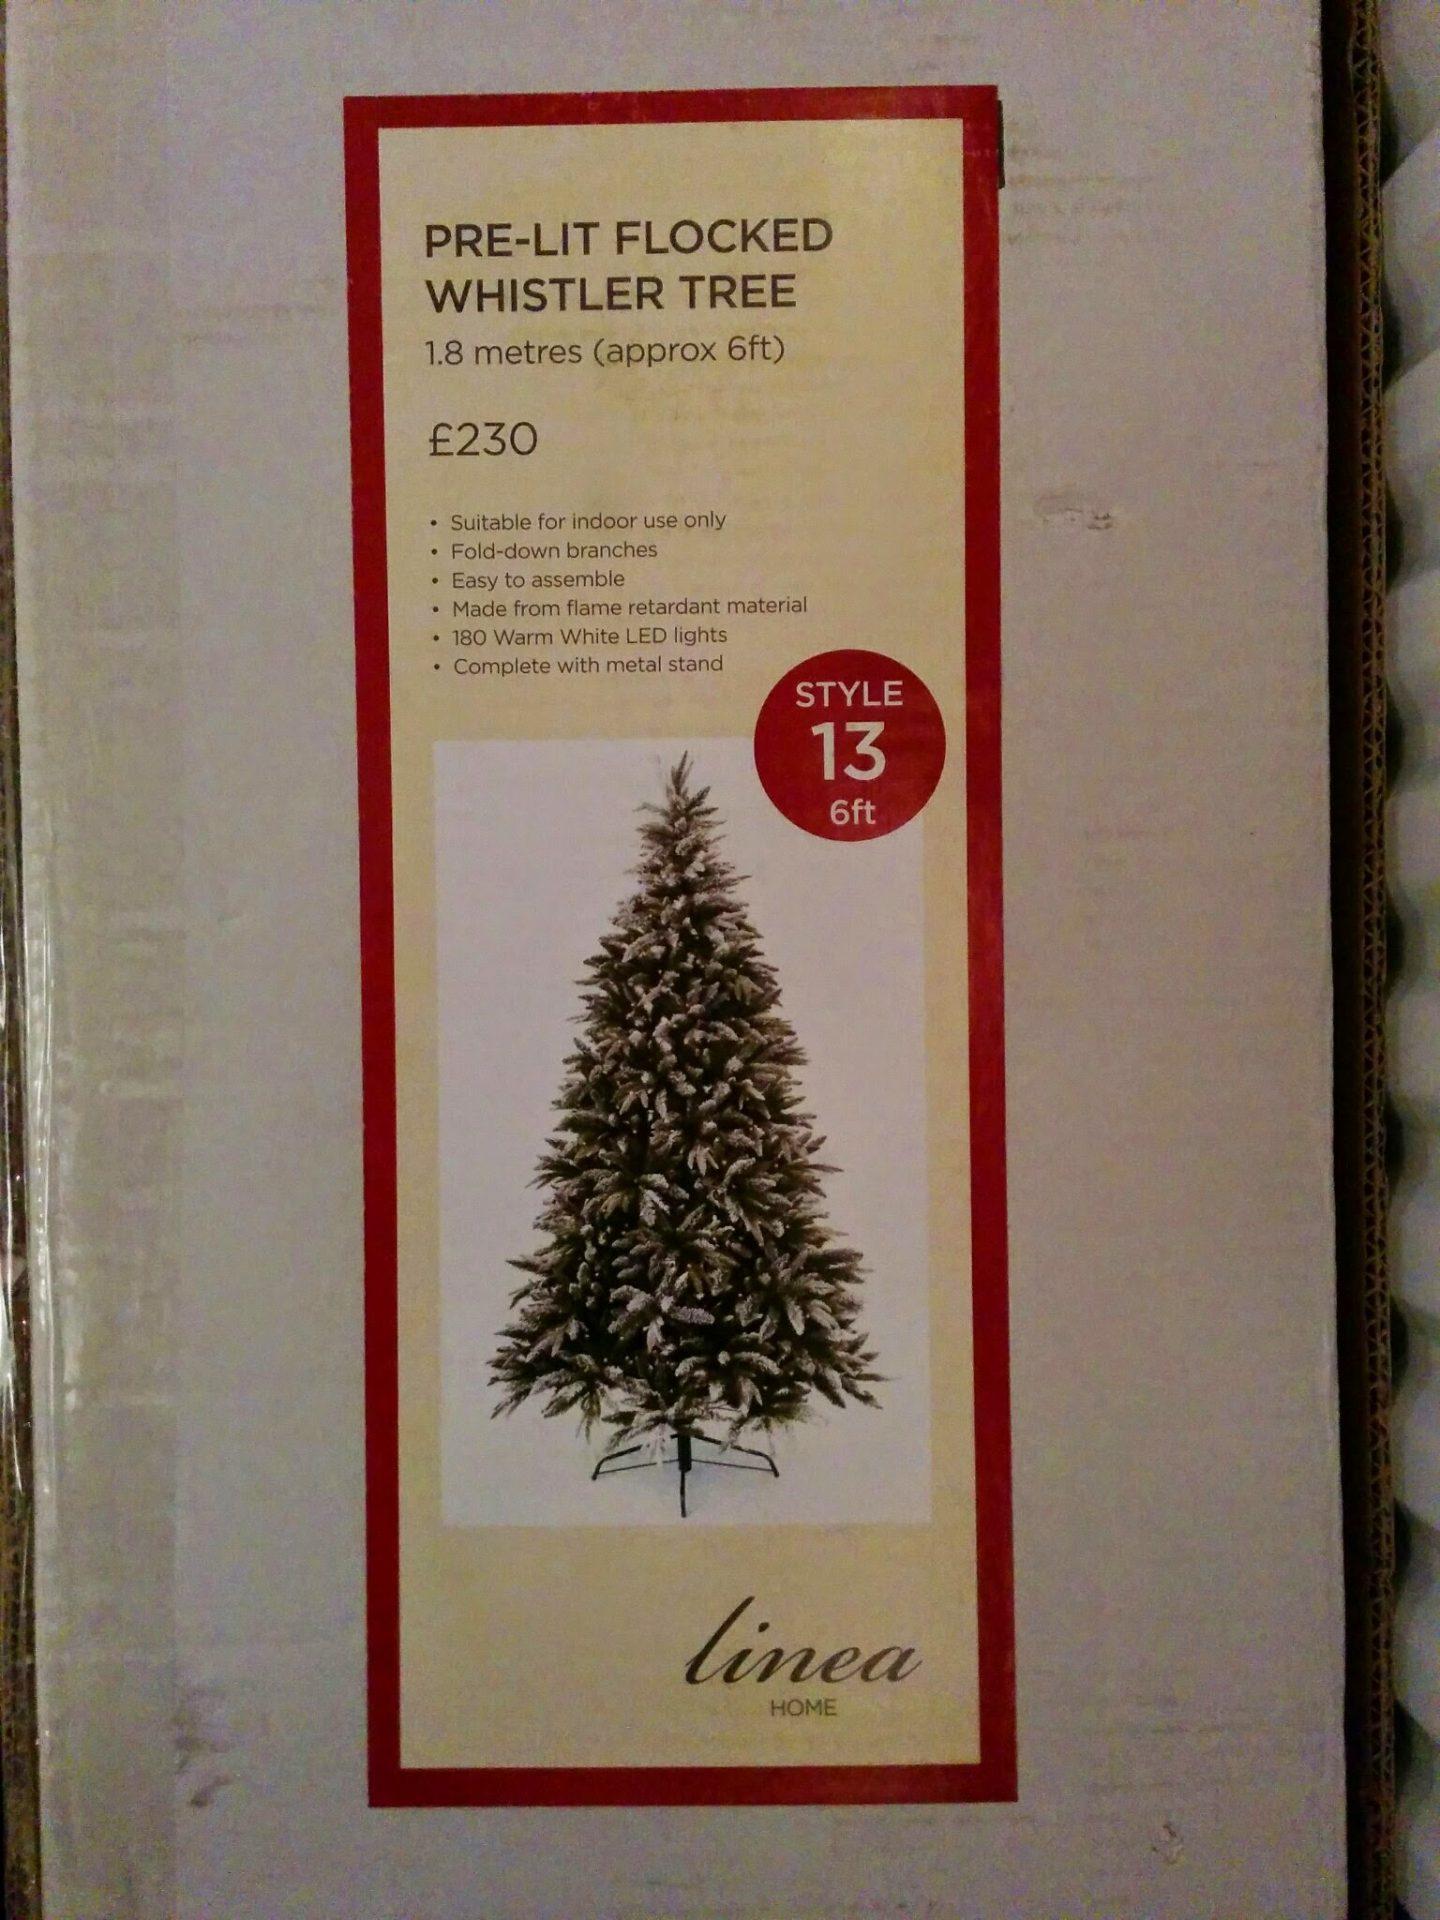 Linea 6ft pre-lit Christmas tree box